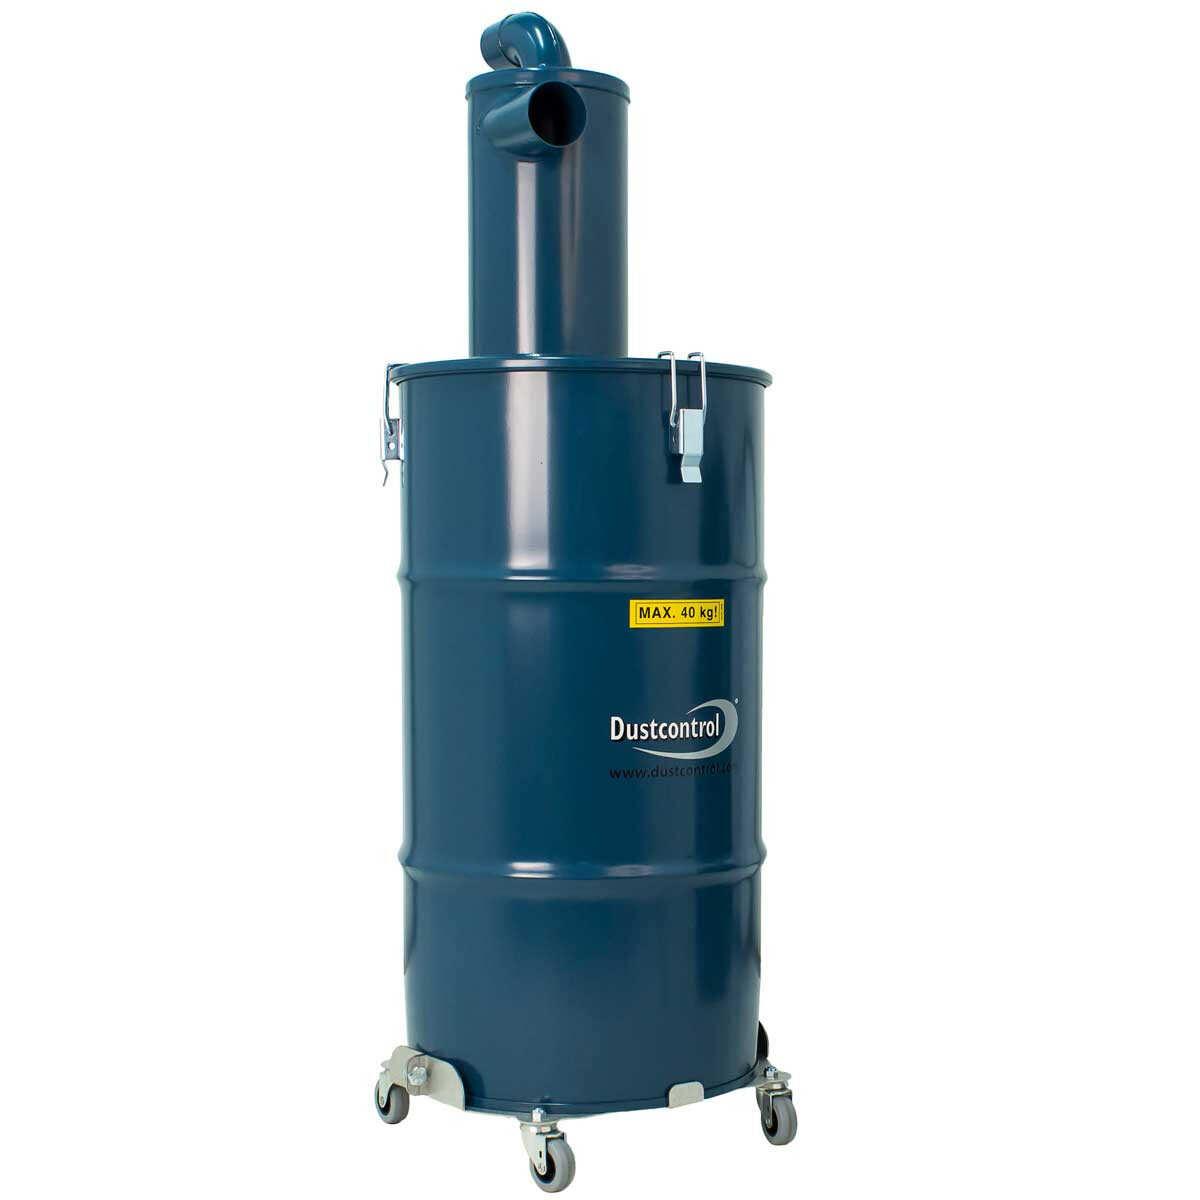 7069 DustControl DCF60 Pre-Separator